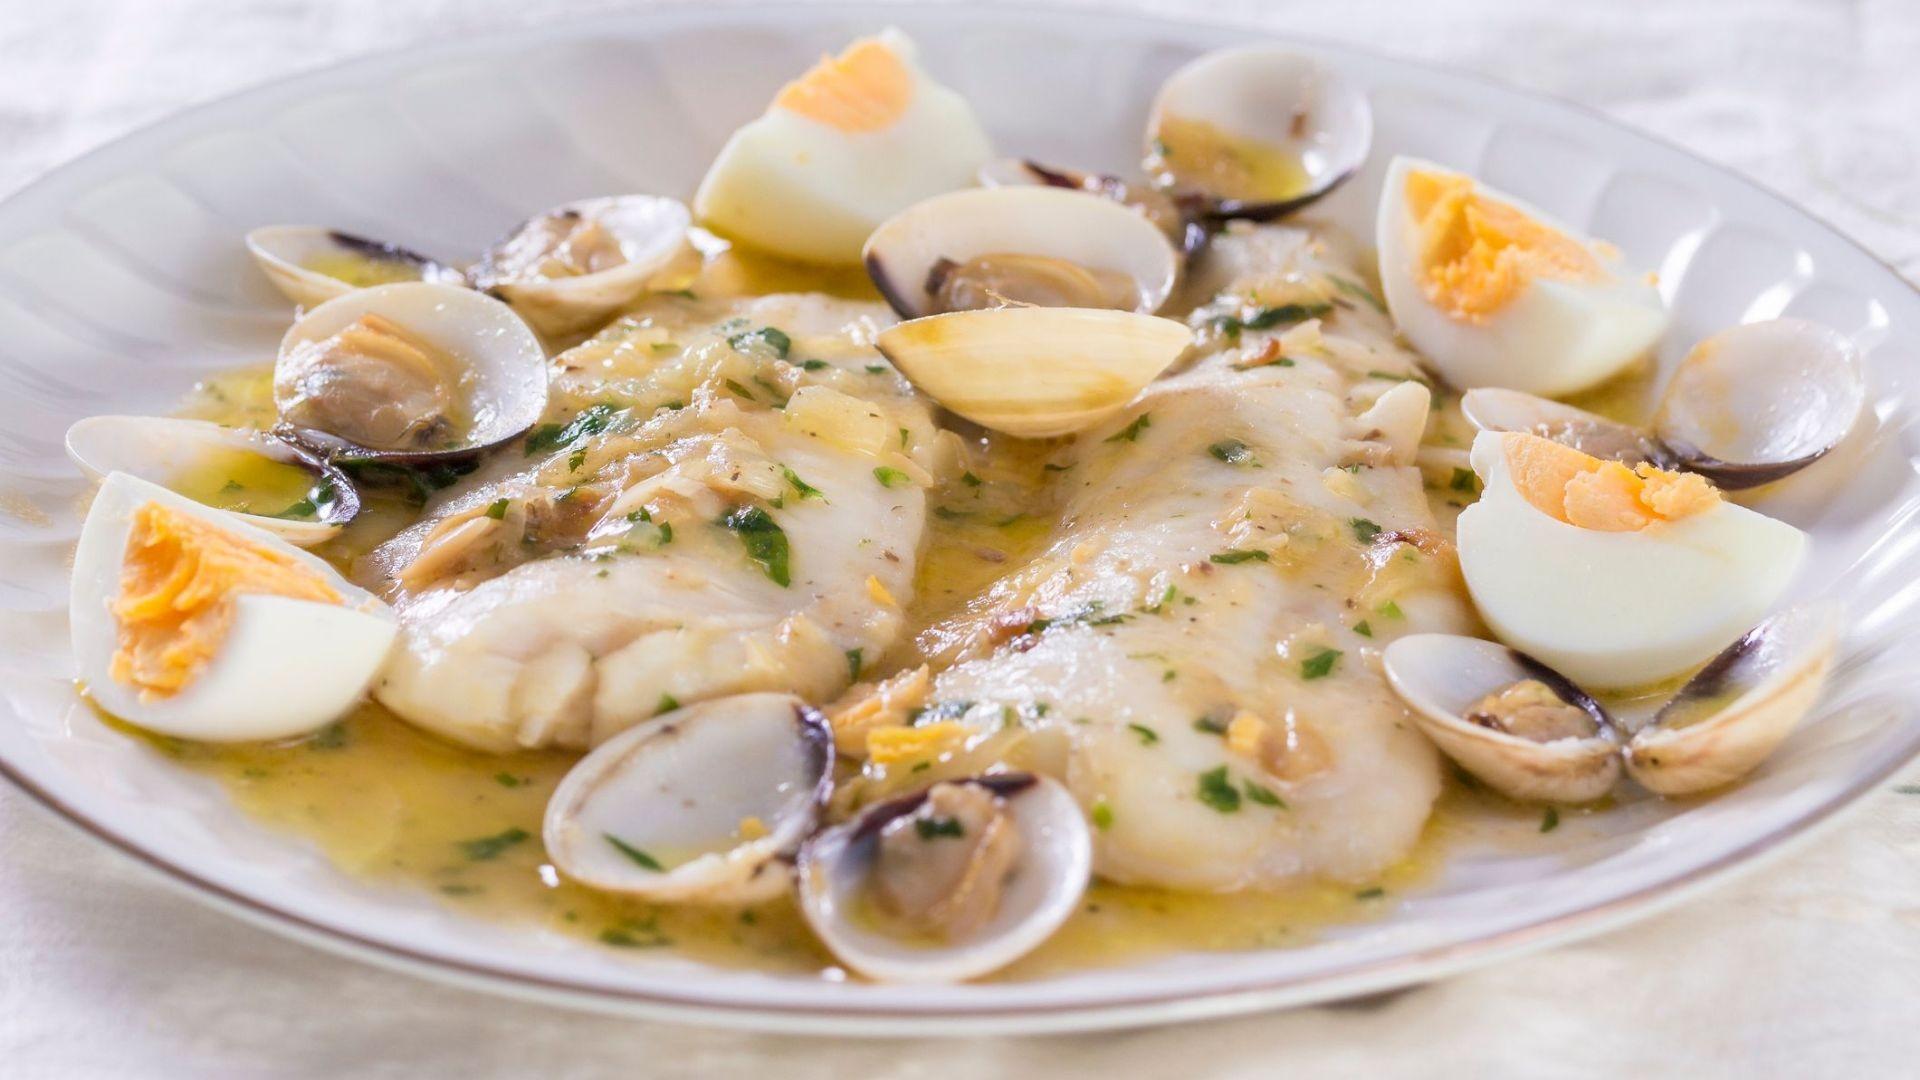 Restaurante especializado en pescados en Molina de Segura